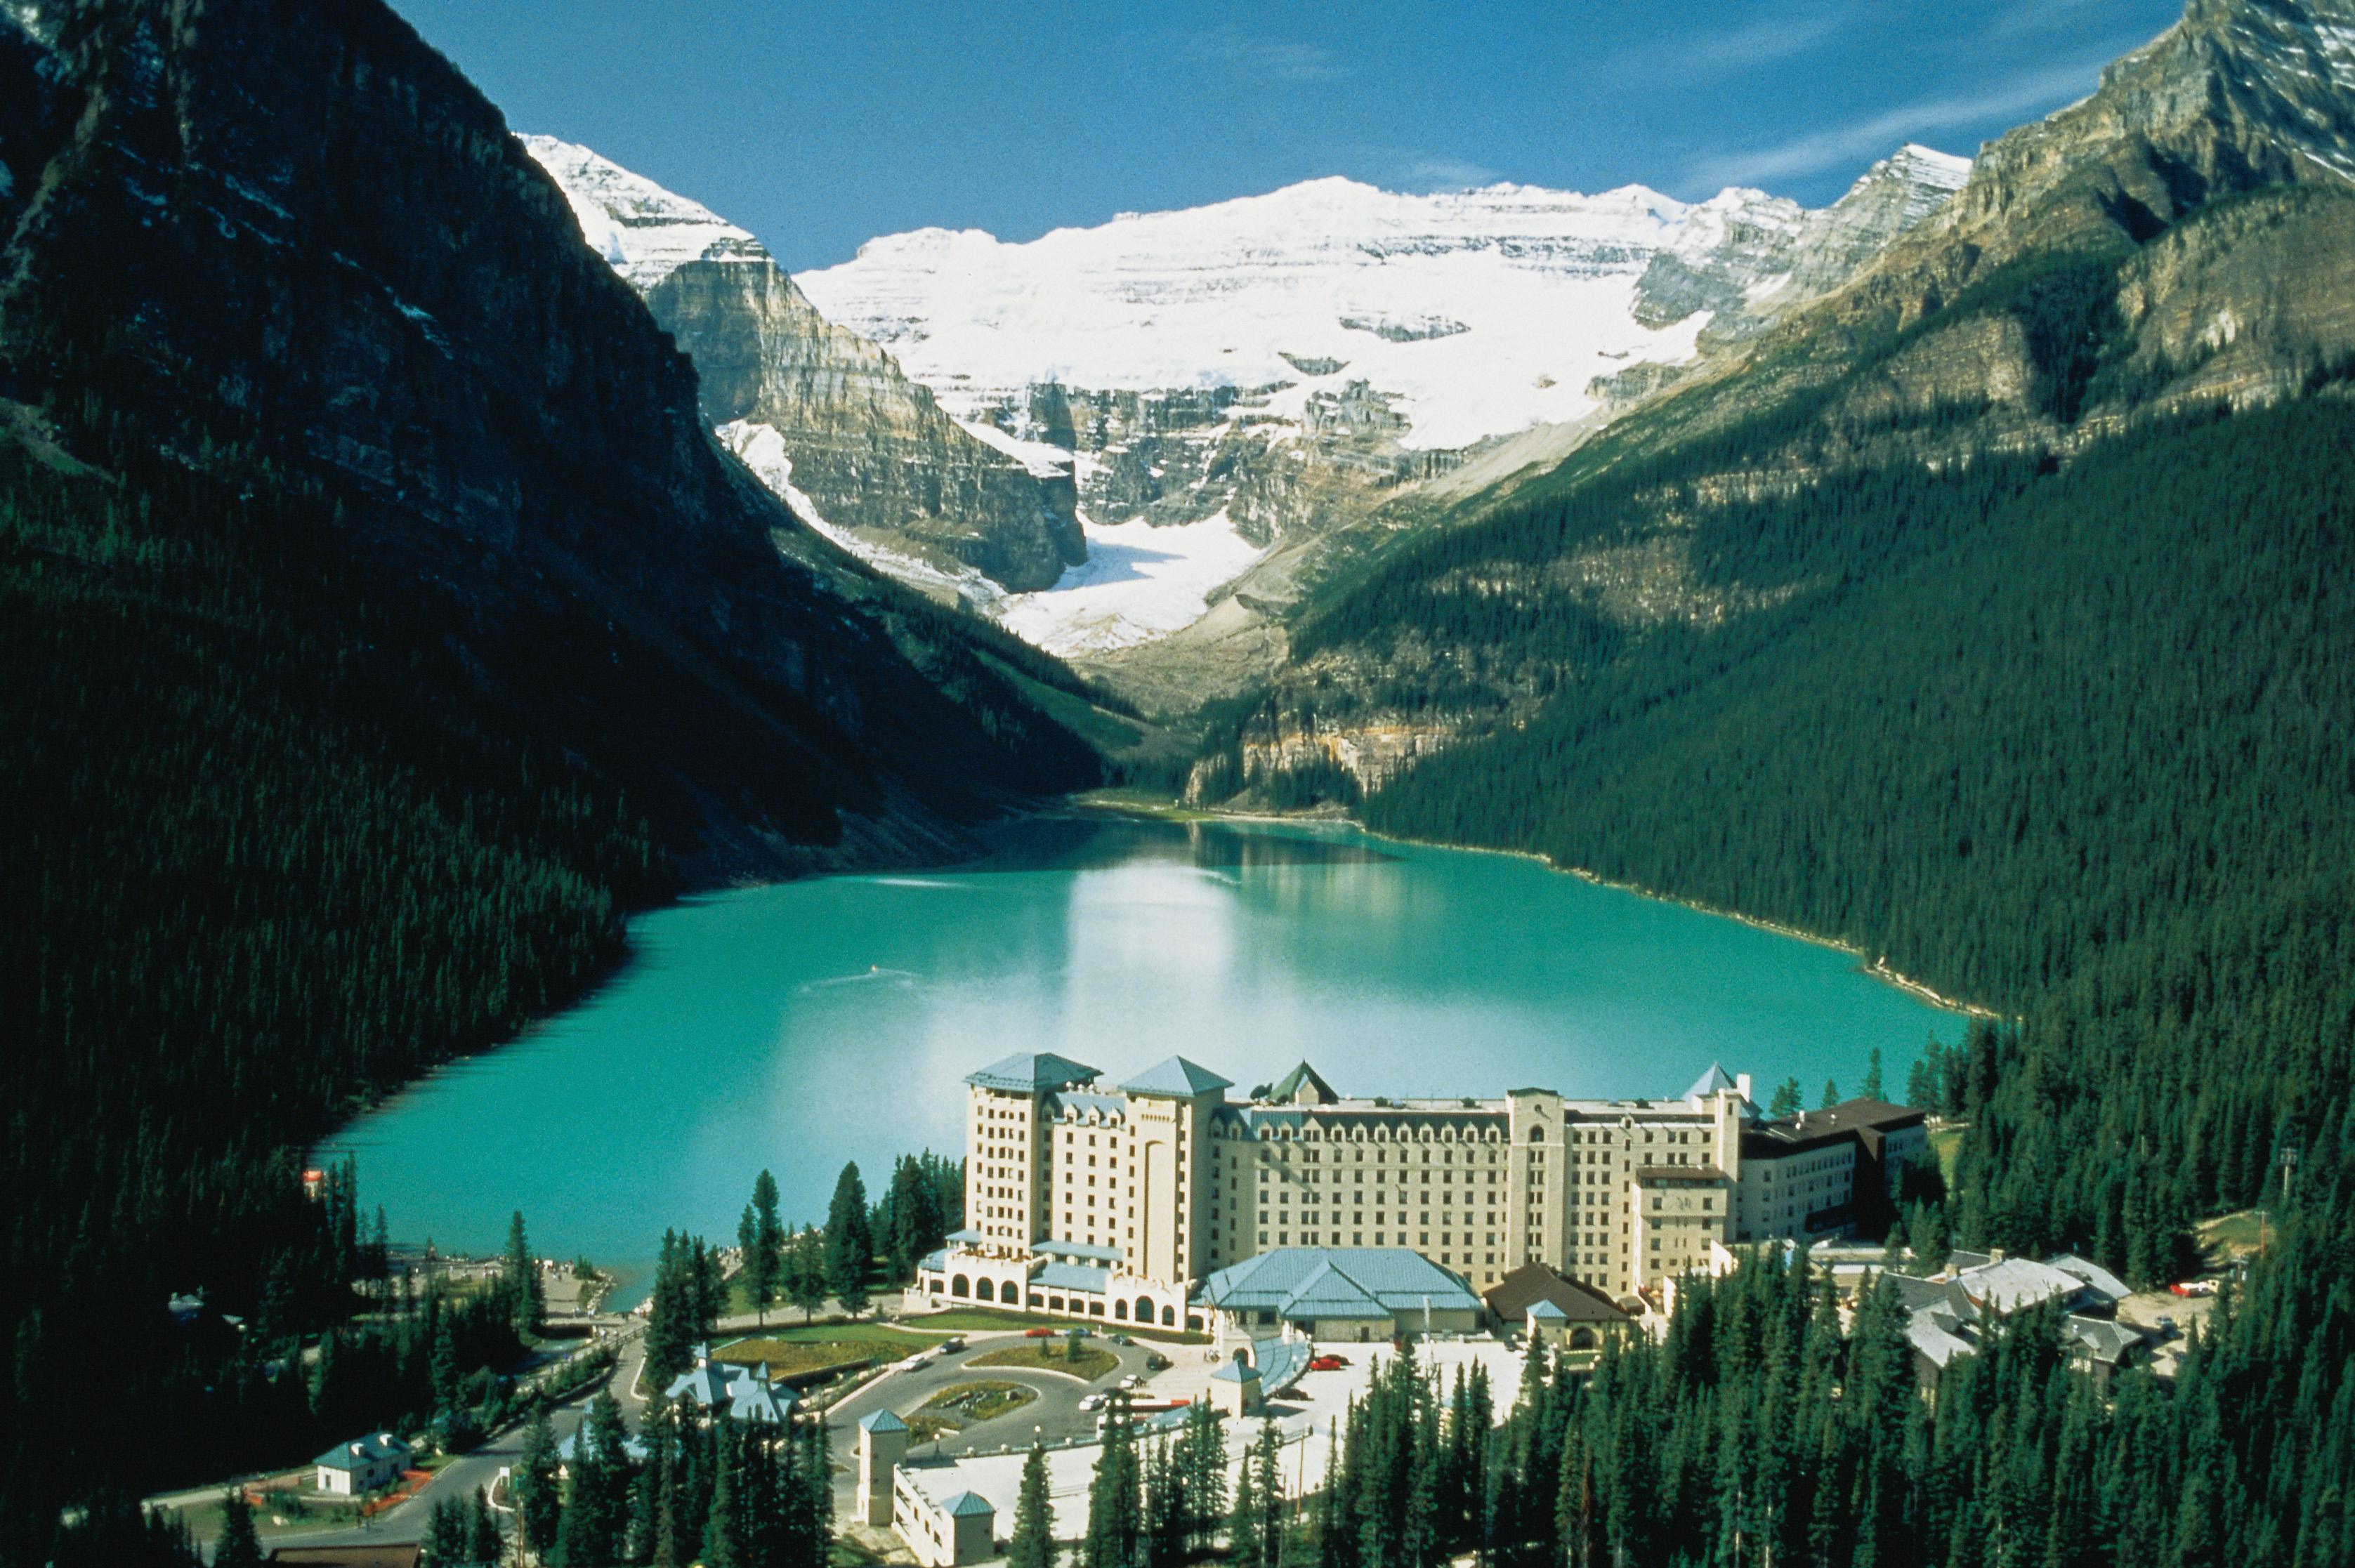 Hotels Near Fairmont Chateau Lake Louise